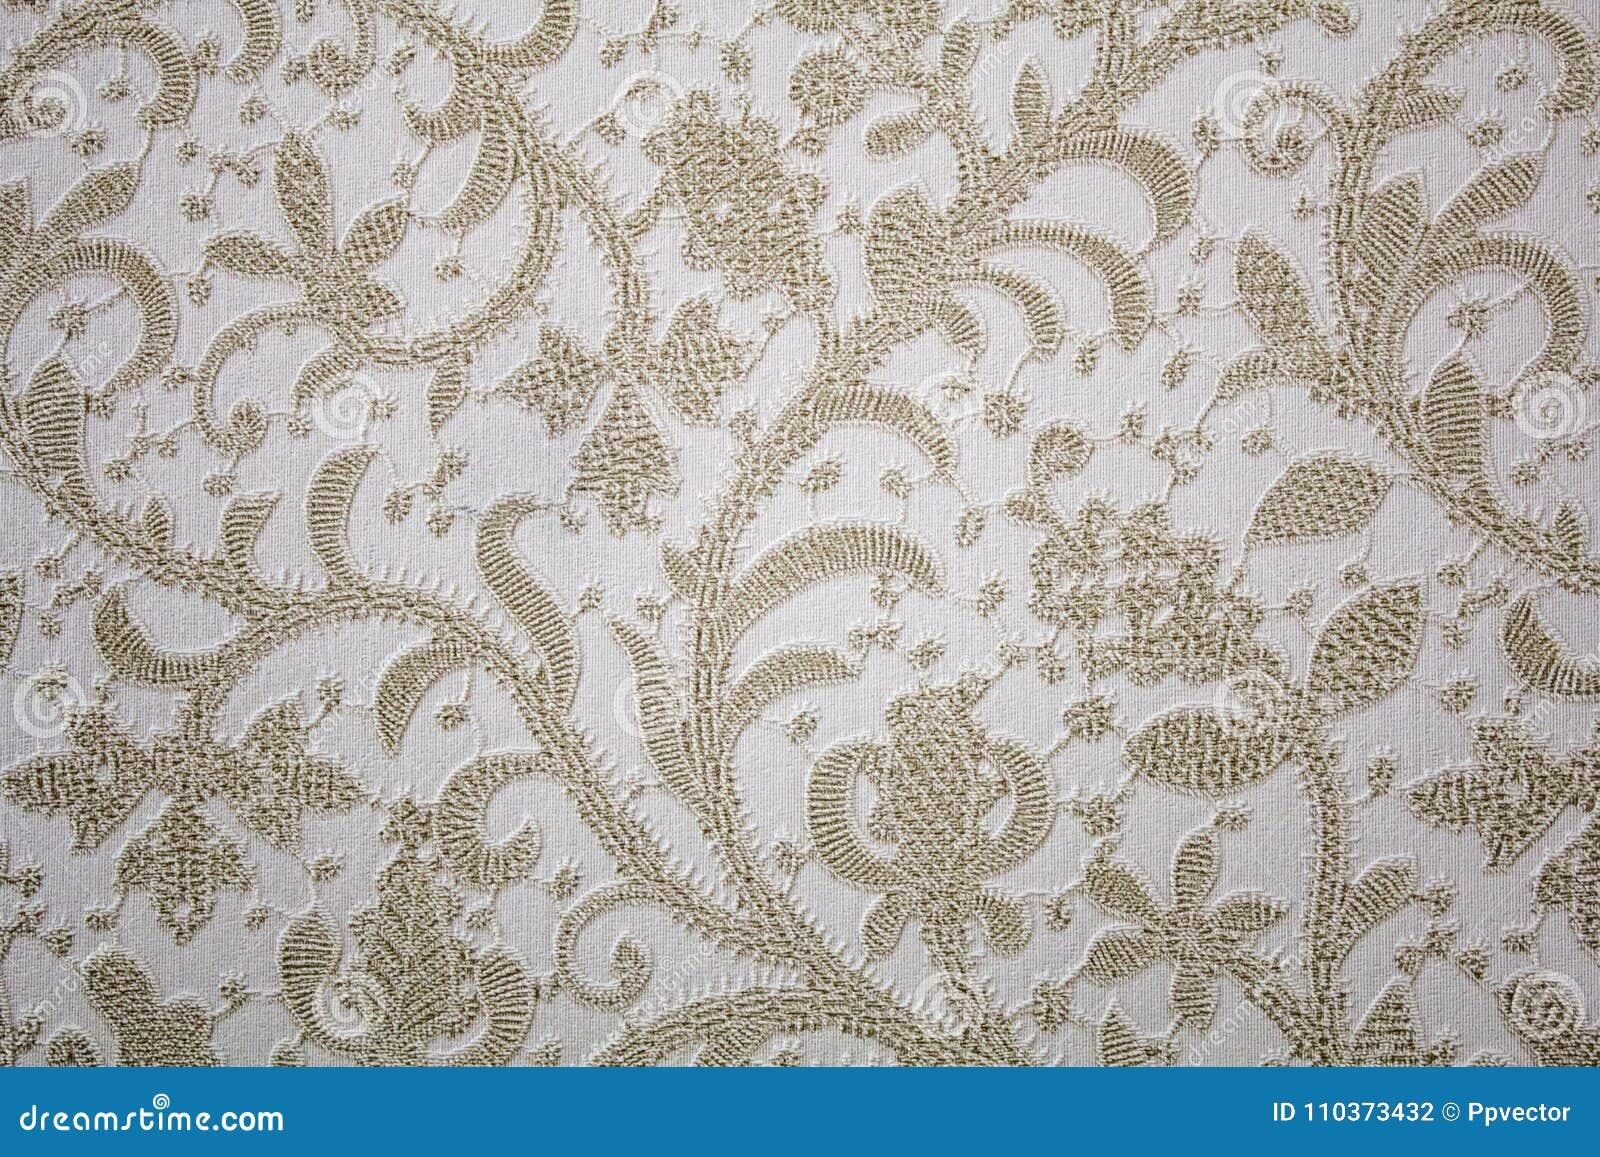 Flower pattern. Brown pattern